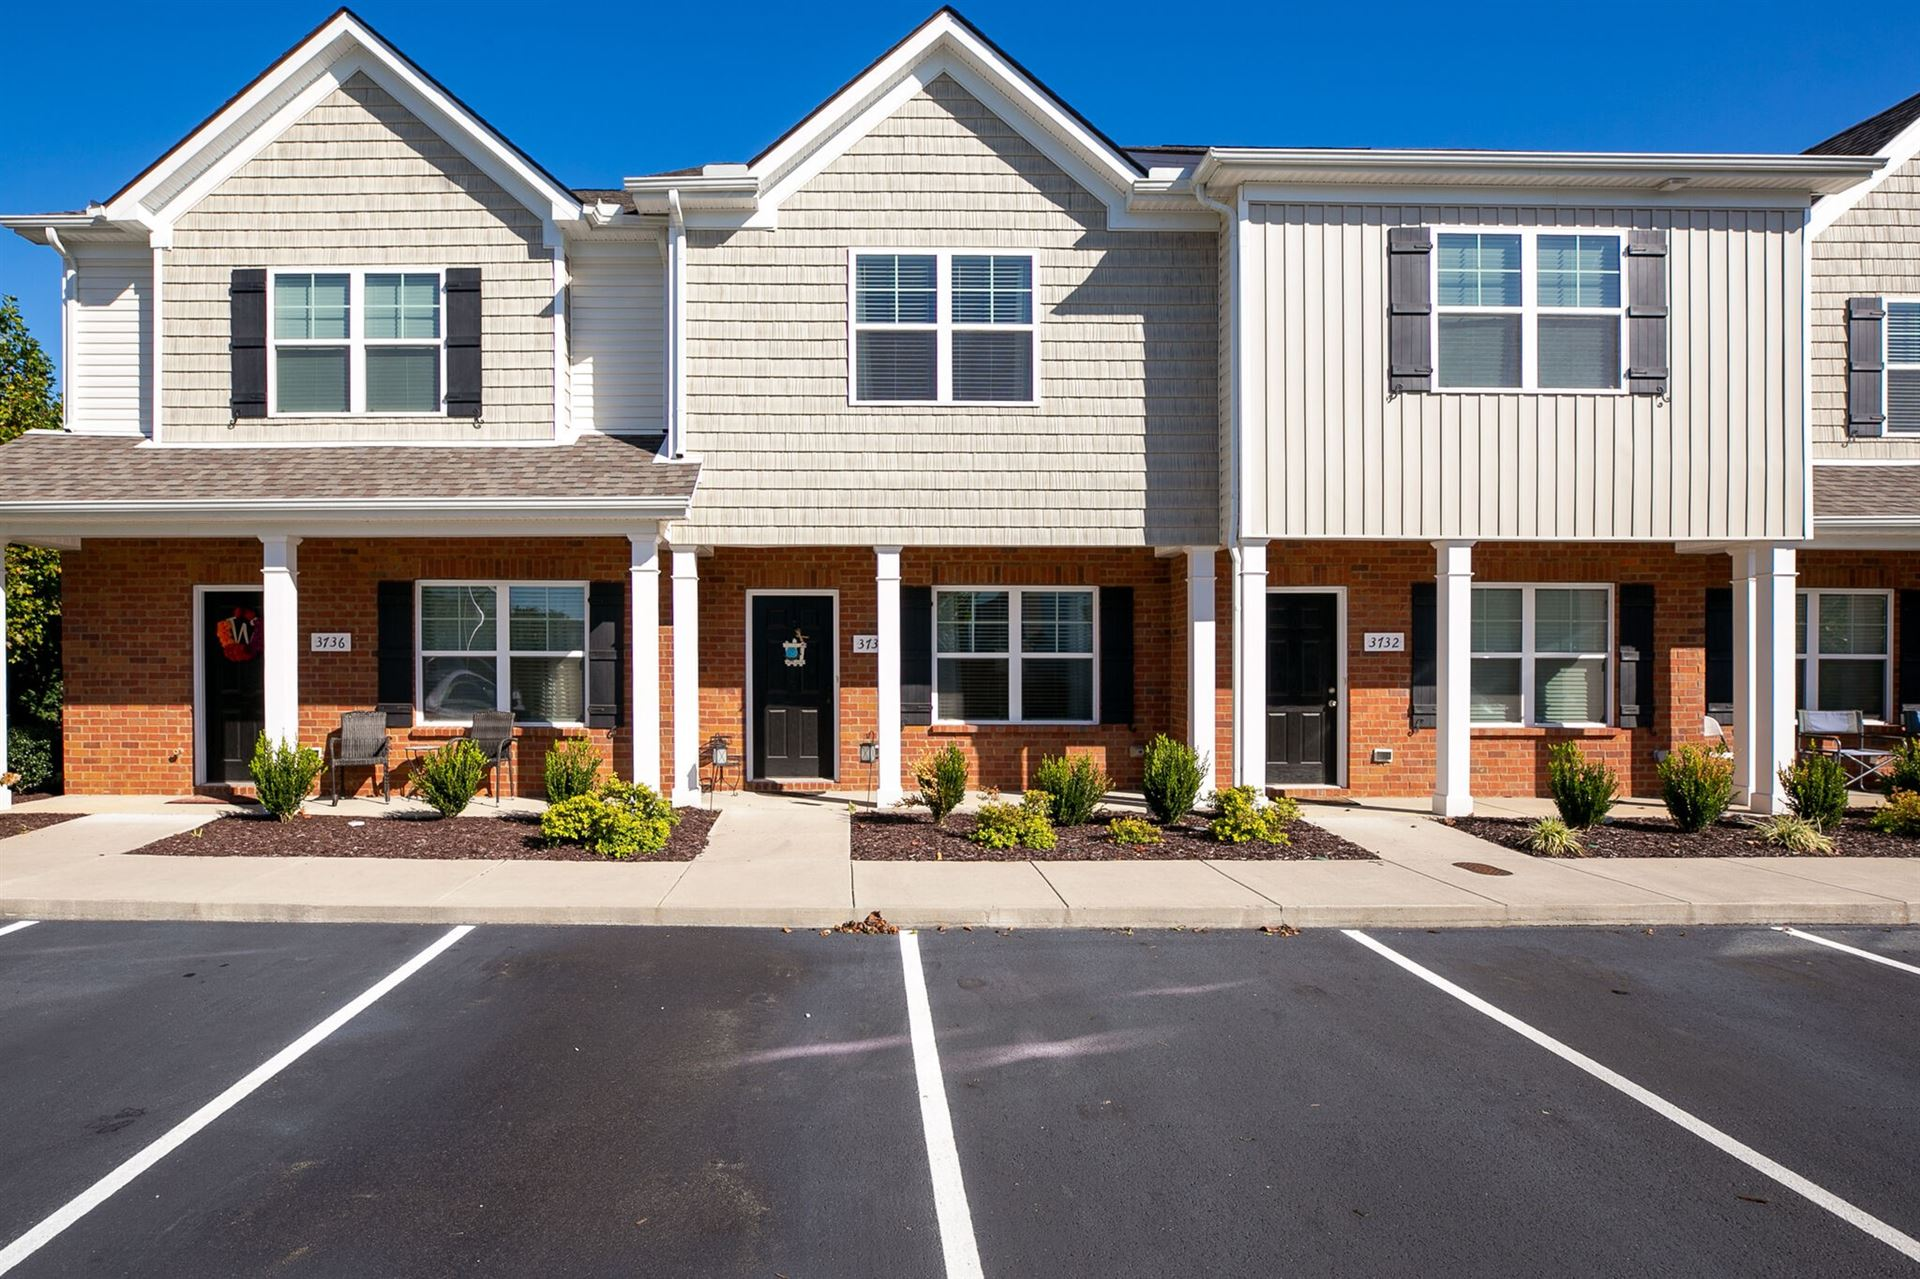 3734 Selina Dr #69, Murfreesboro, TN 37128 - MLS#: 2301198